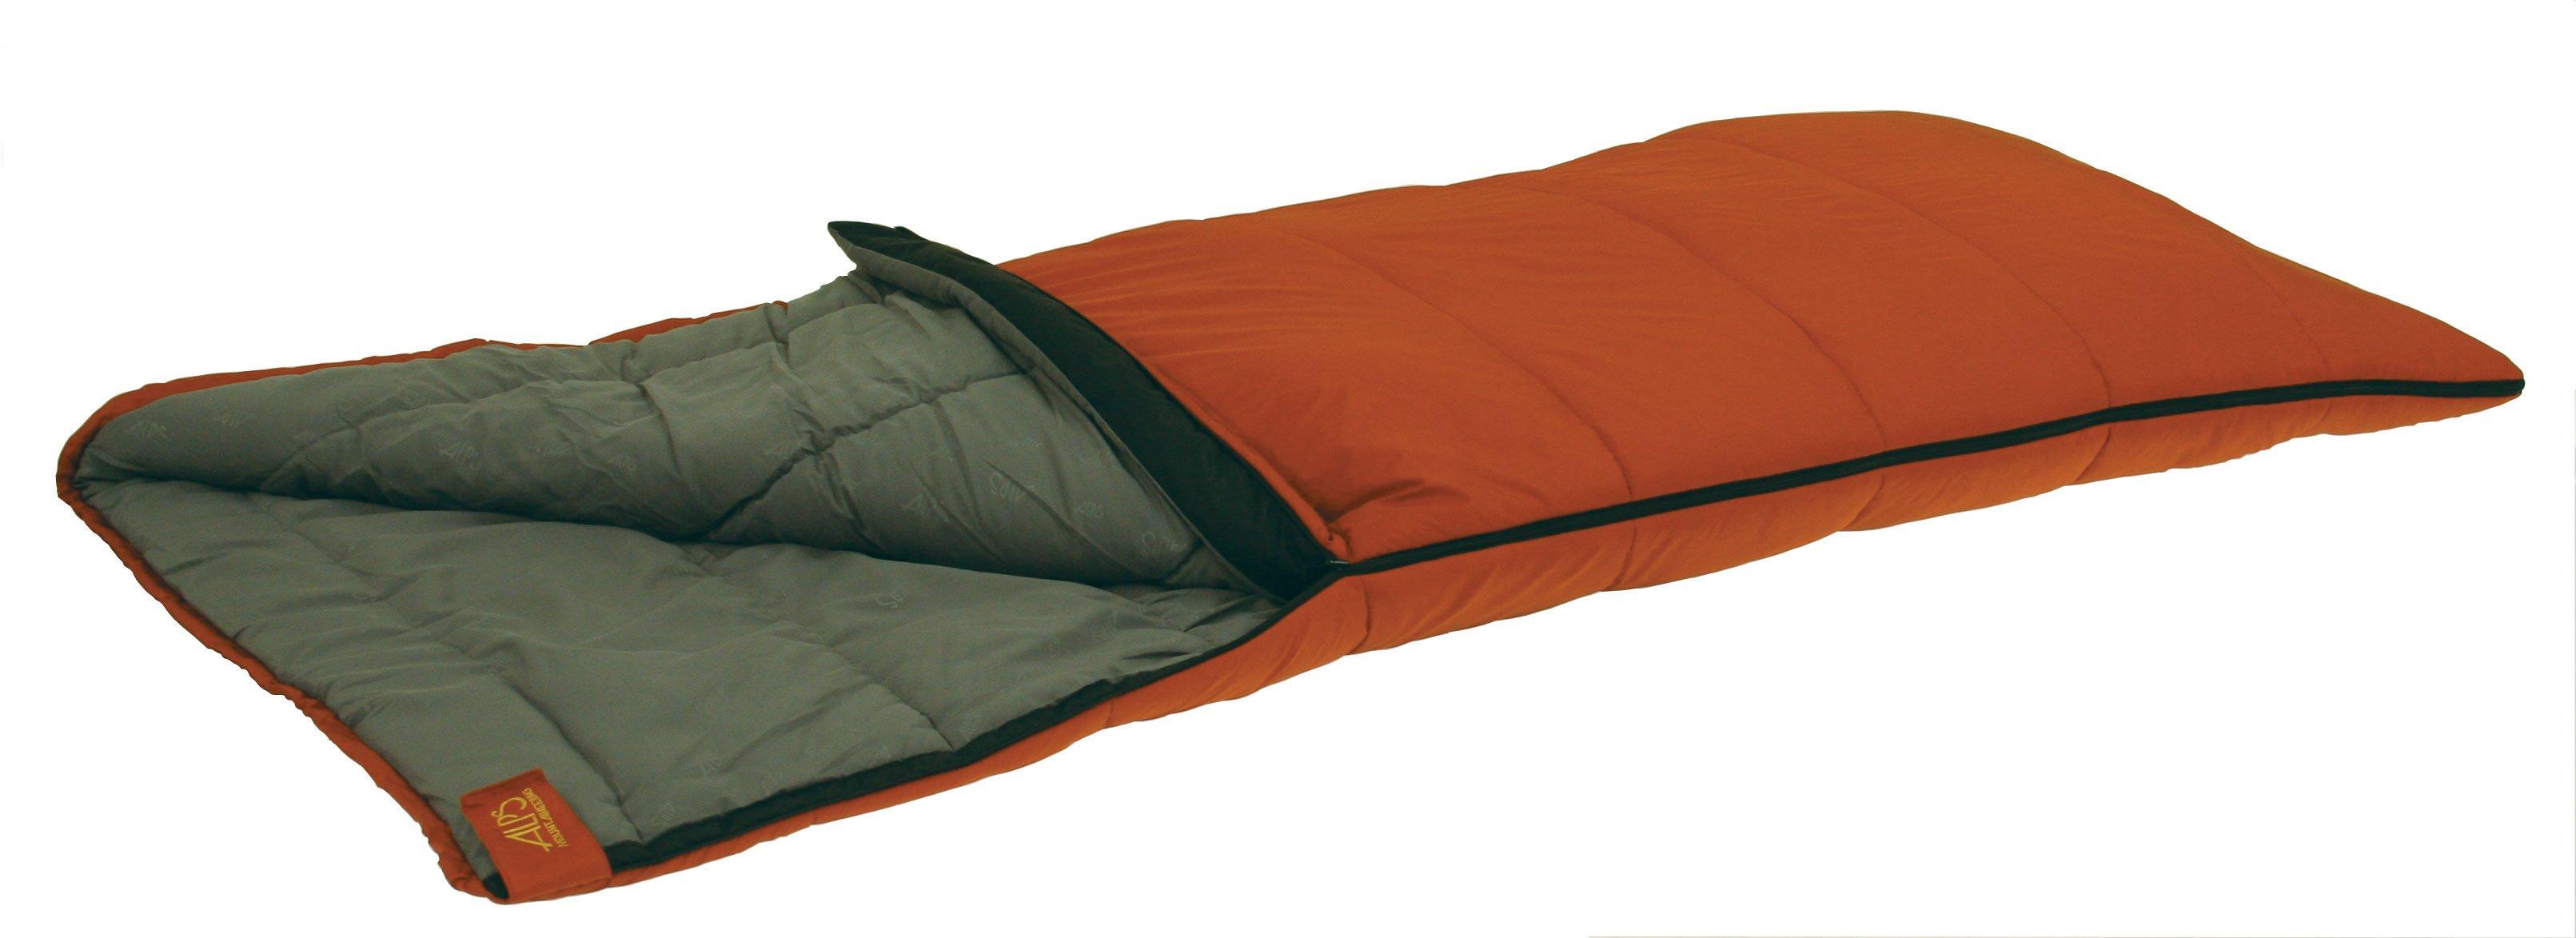 Alps 20 Degree Sleeping Bag Gently Used